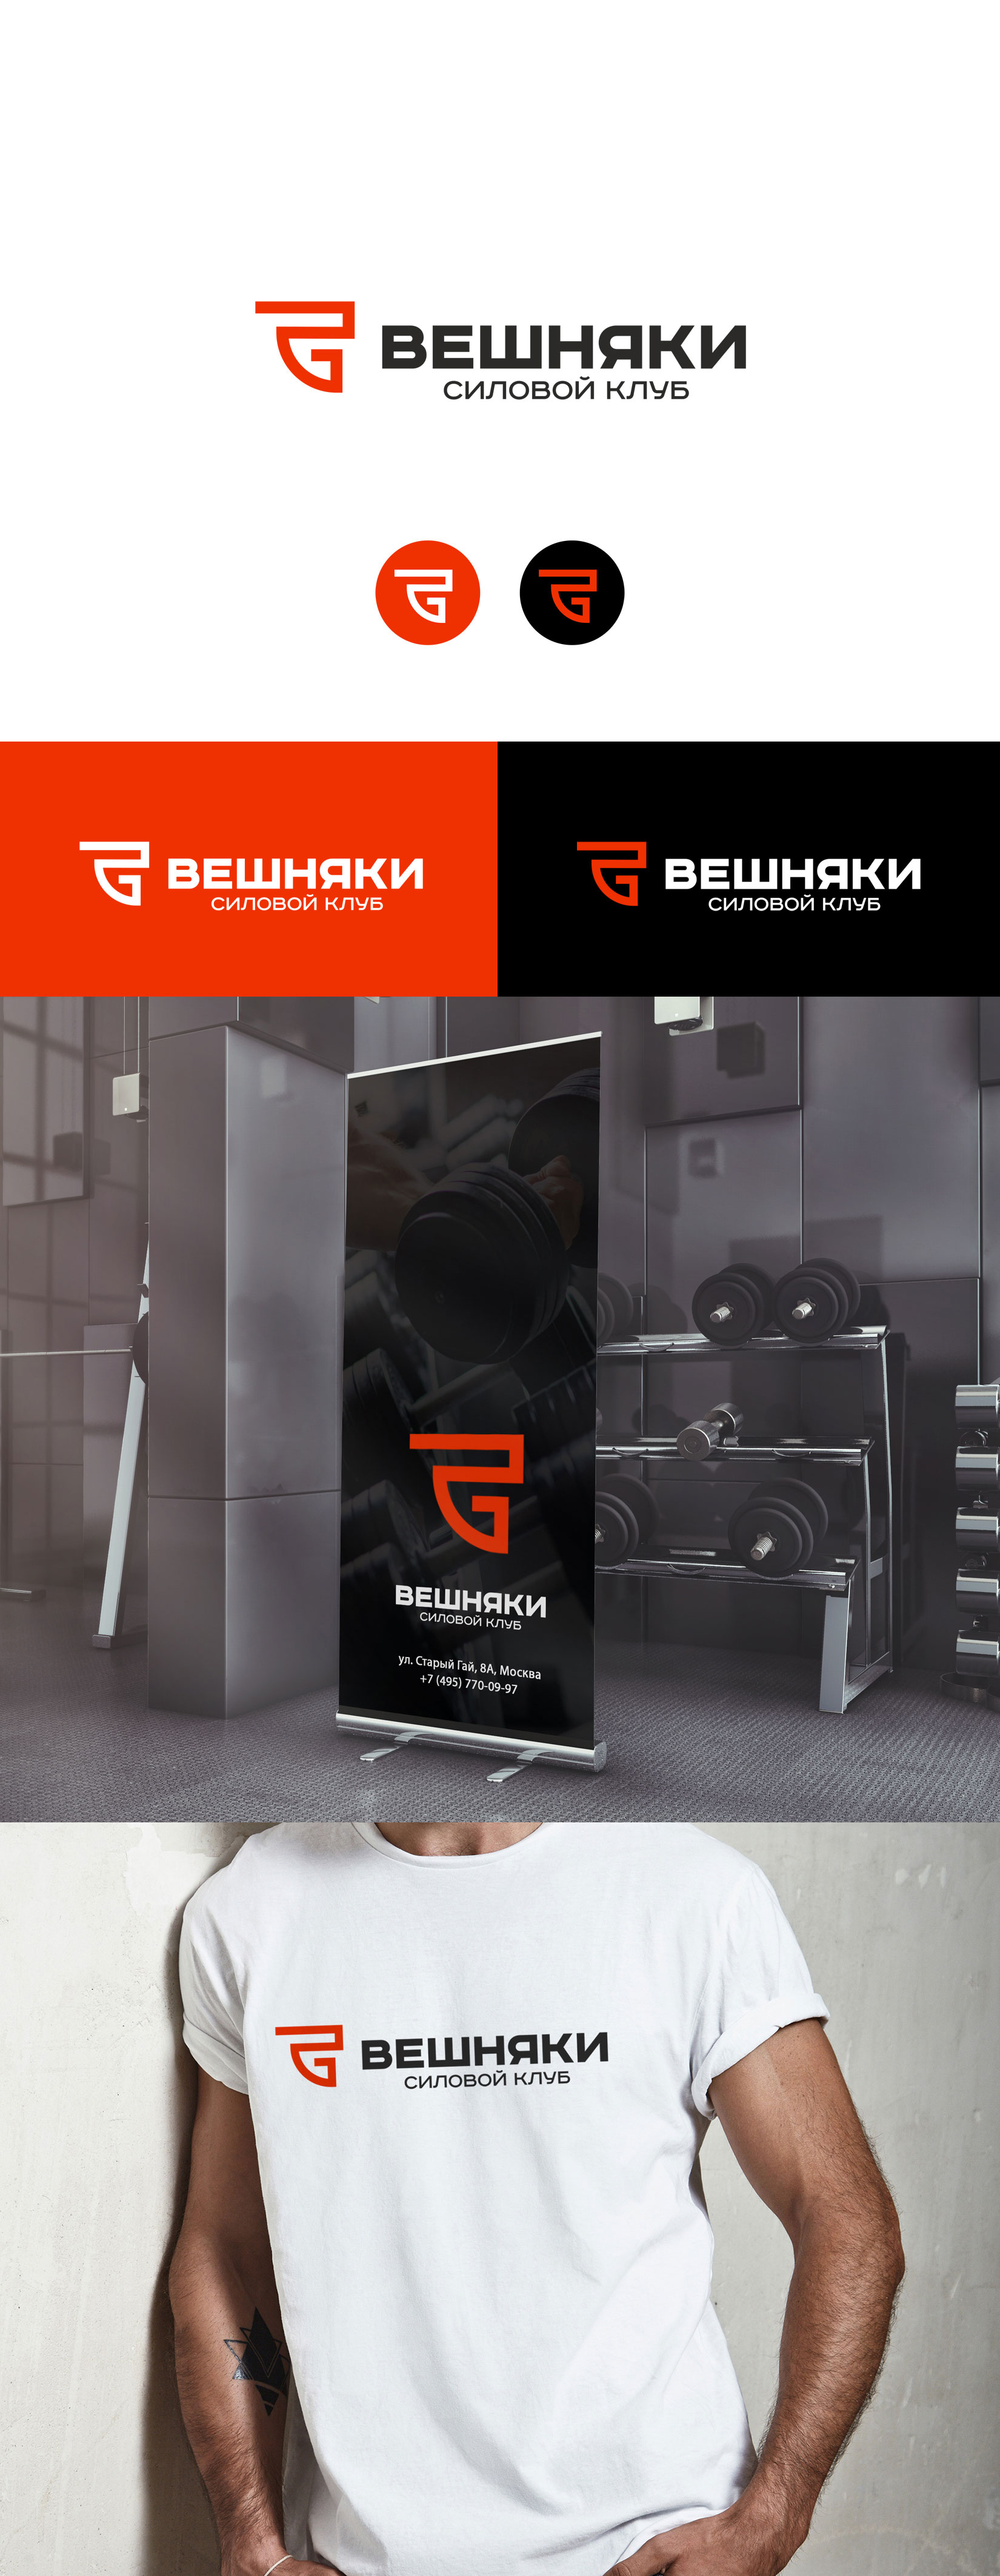 Адаптация (разработка) логотипа Силового клуба ВЕШНЯКИ в инт фото f_5875fb9066c395be.jpg